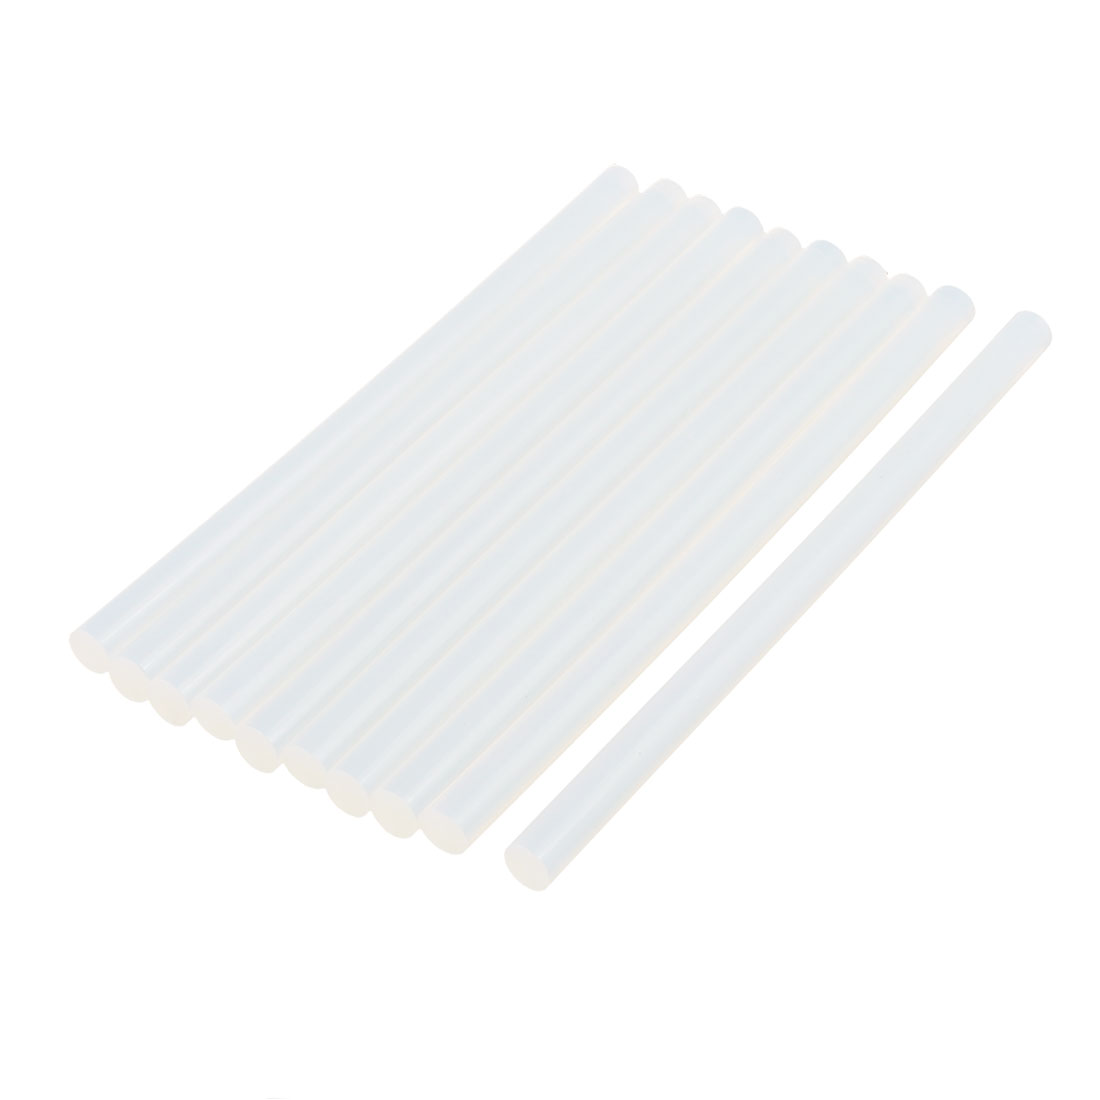 10 Pcs 11mm x 190mm Hot Melt Glue Adhesive Stick Clear for Electric Tool Heating Gun